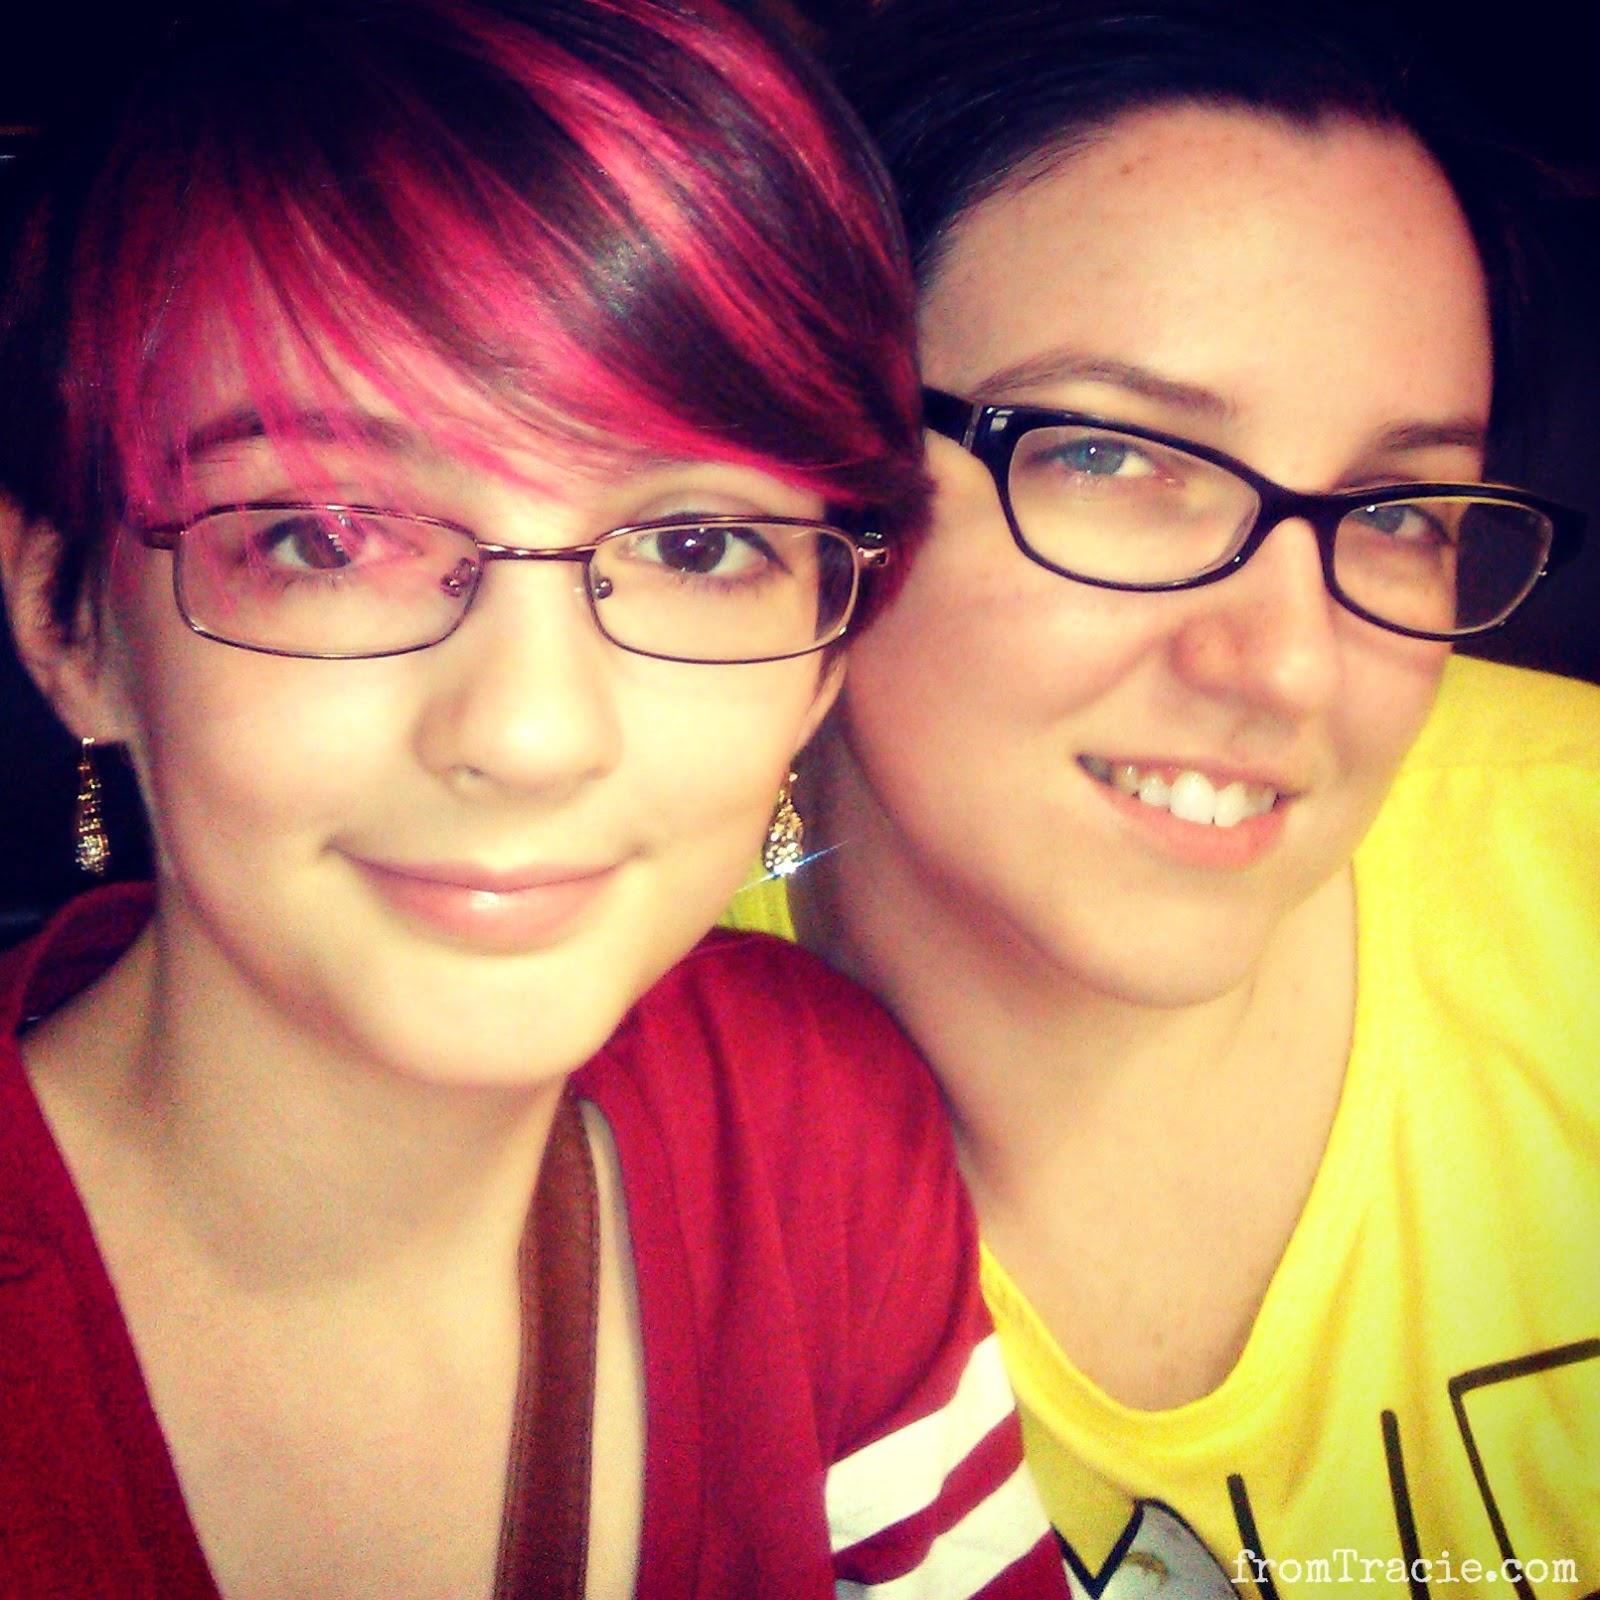 Katarina and Tracie Nall